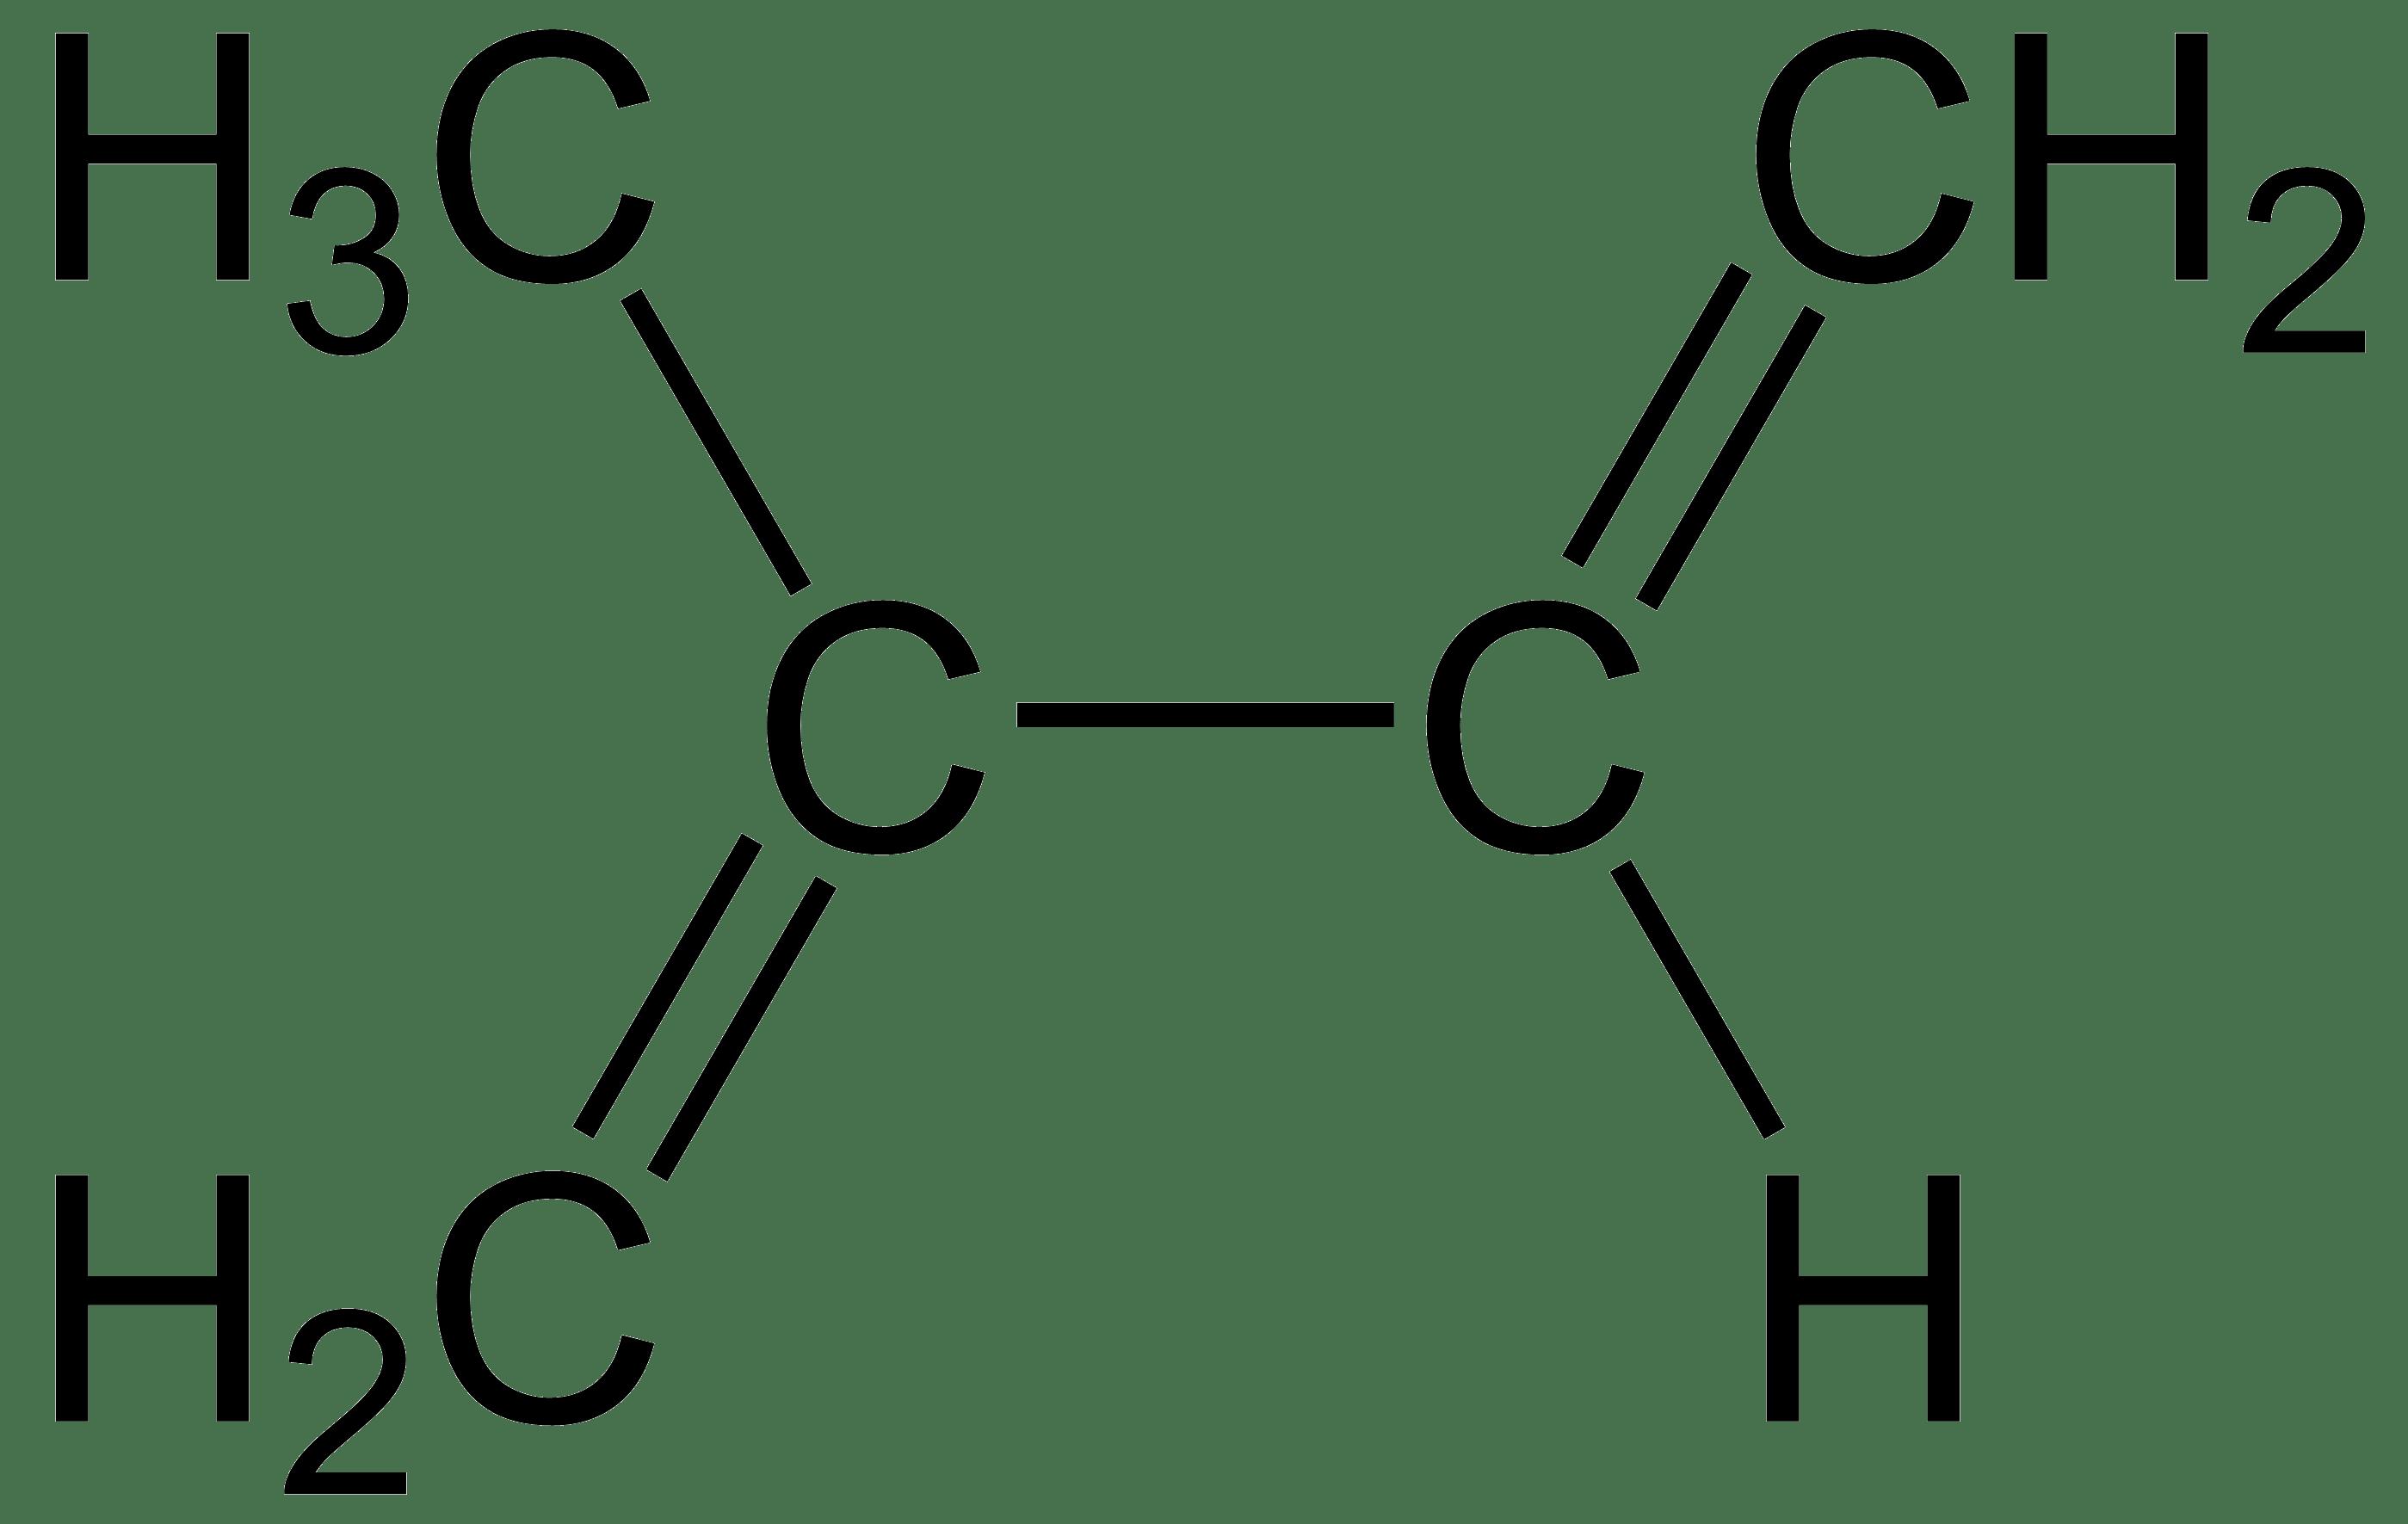 Estructura del isopreno